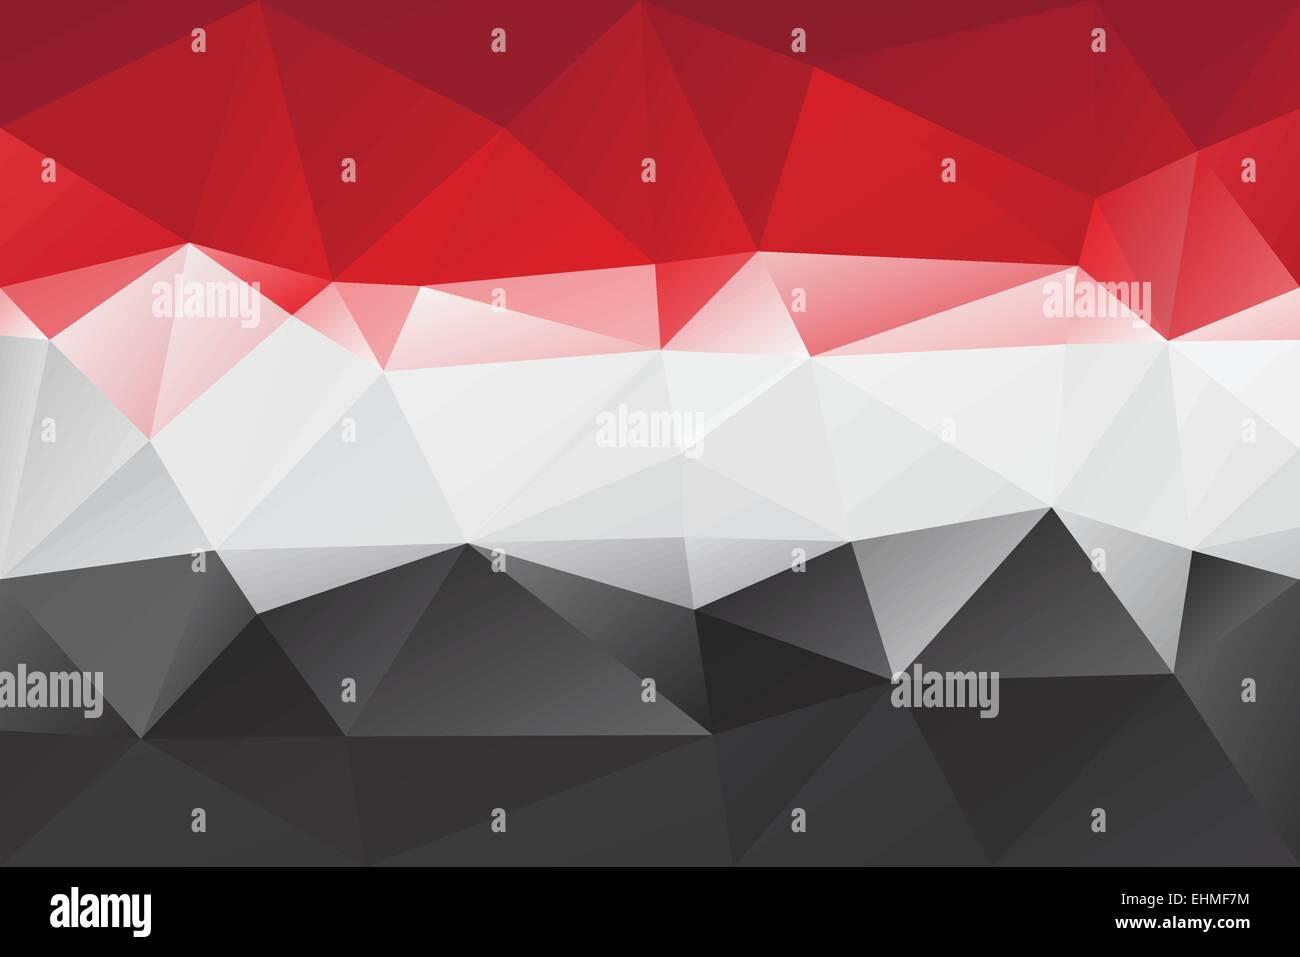 Yemen flag - triangular polygonal pattern - Stock Vector